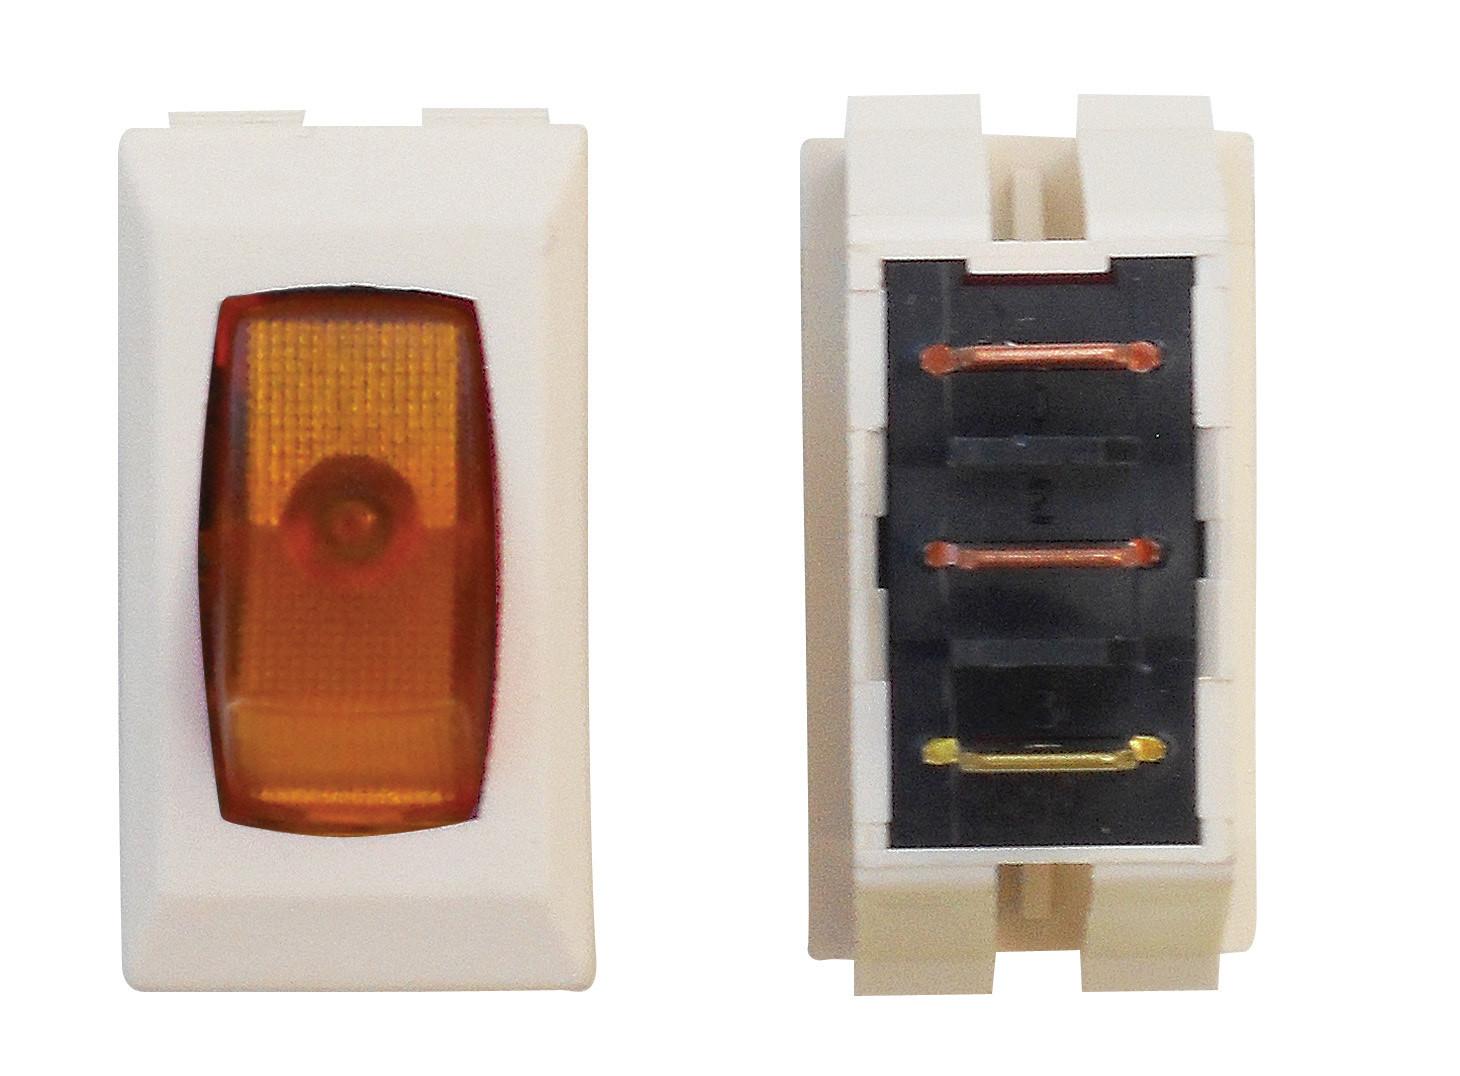 Illuminated On/Off Switch - Amber/Ivory 1/card